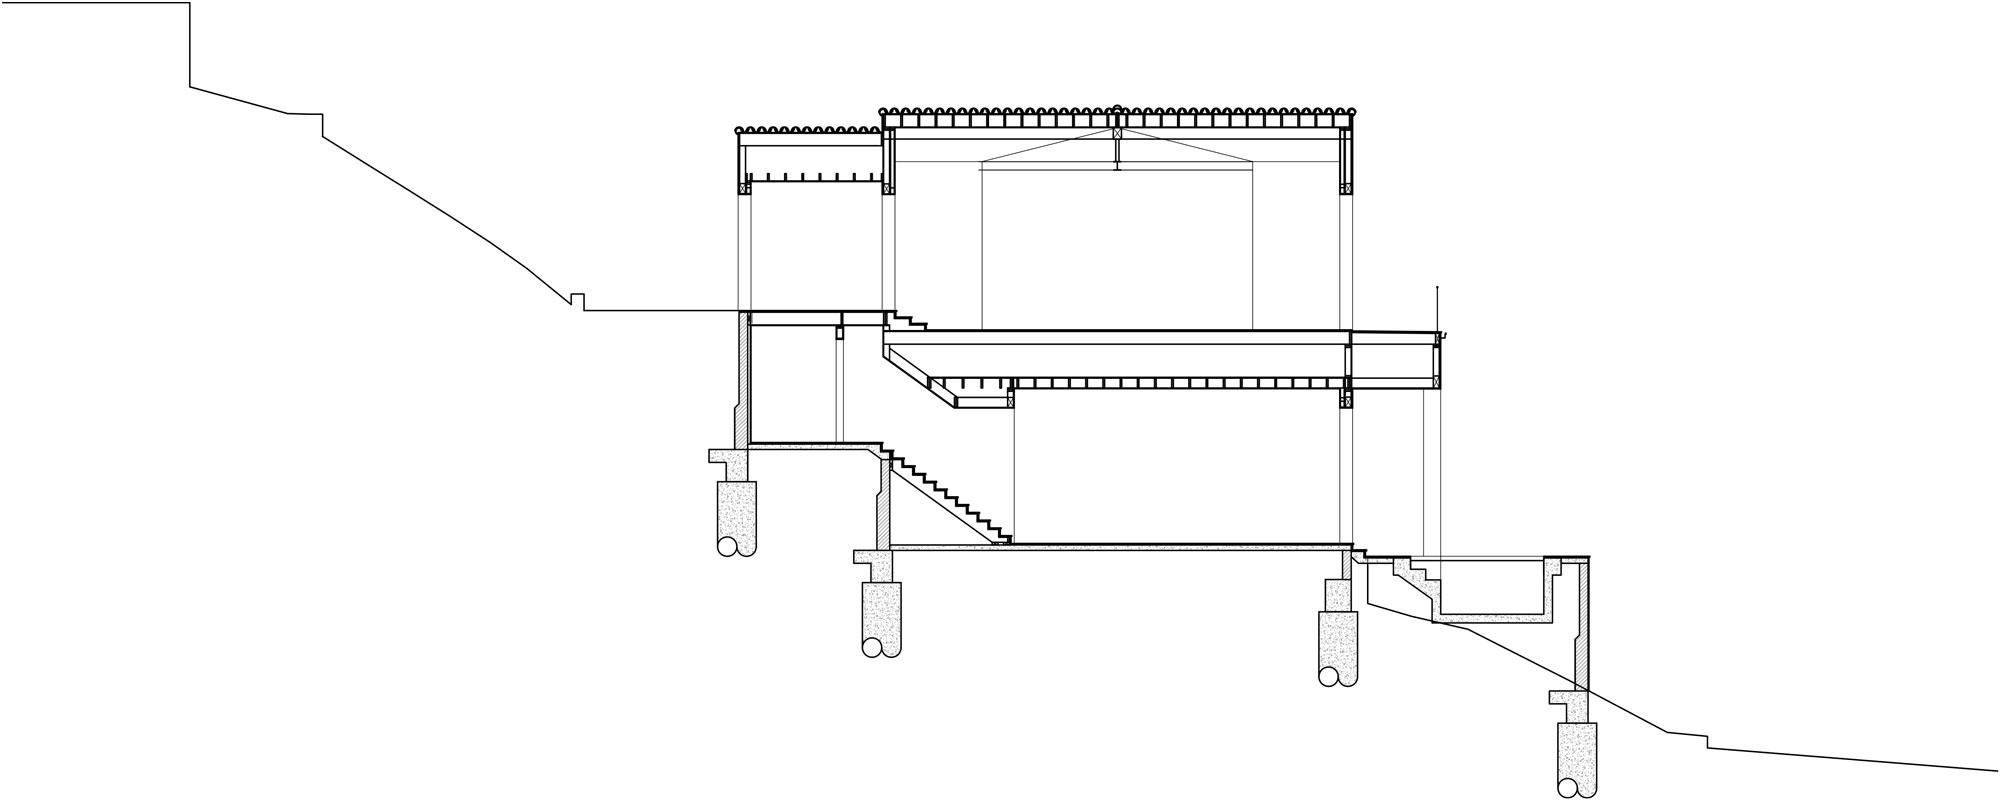 5-HOLLYWOOD-ART-STUDIO-SITE-SECTION.jpg